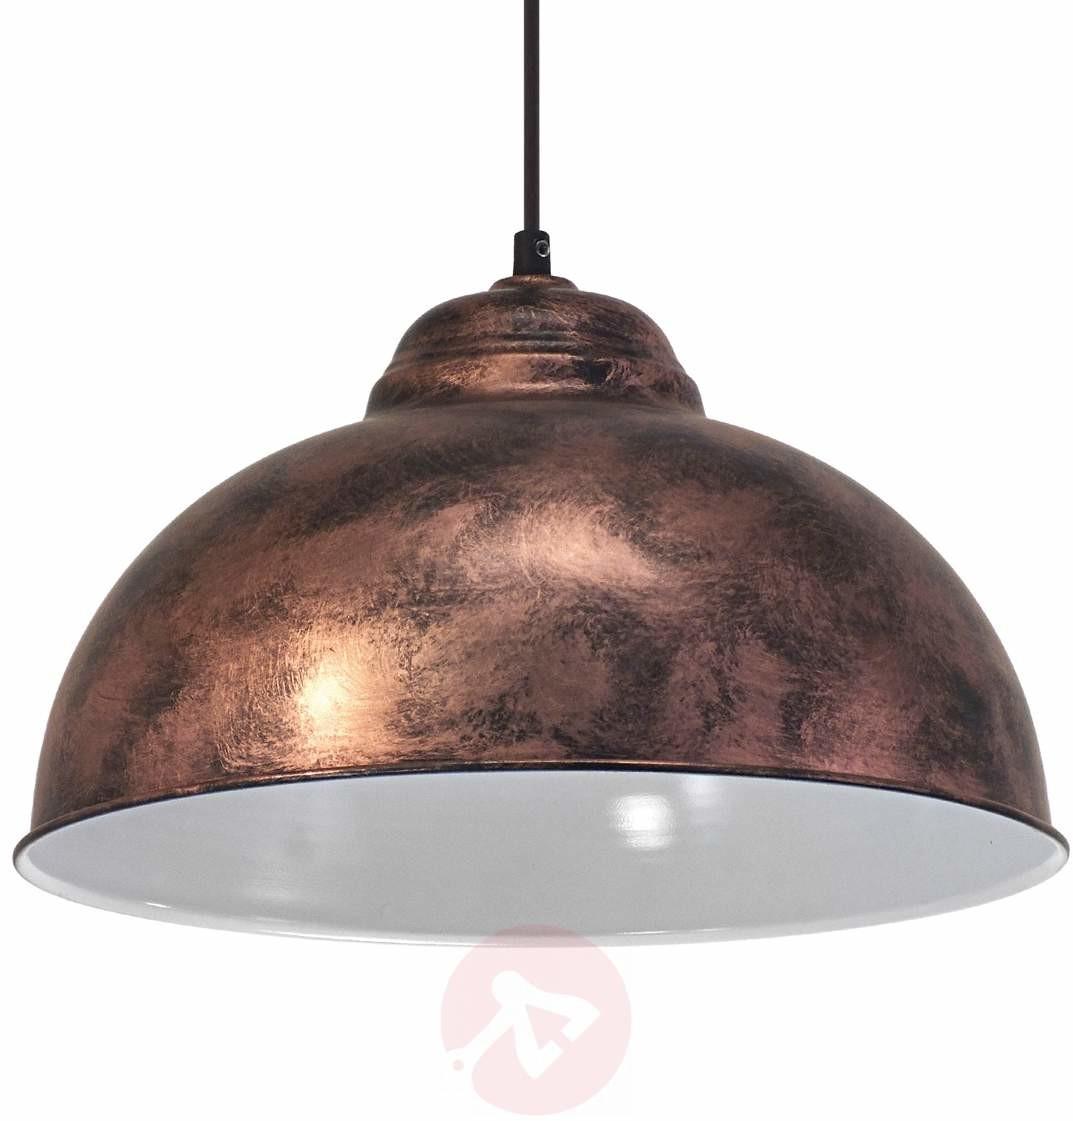 Eglo Stalowa lampa wisząca JONIN (49248)